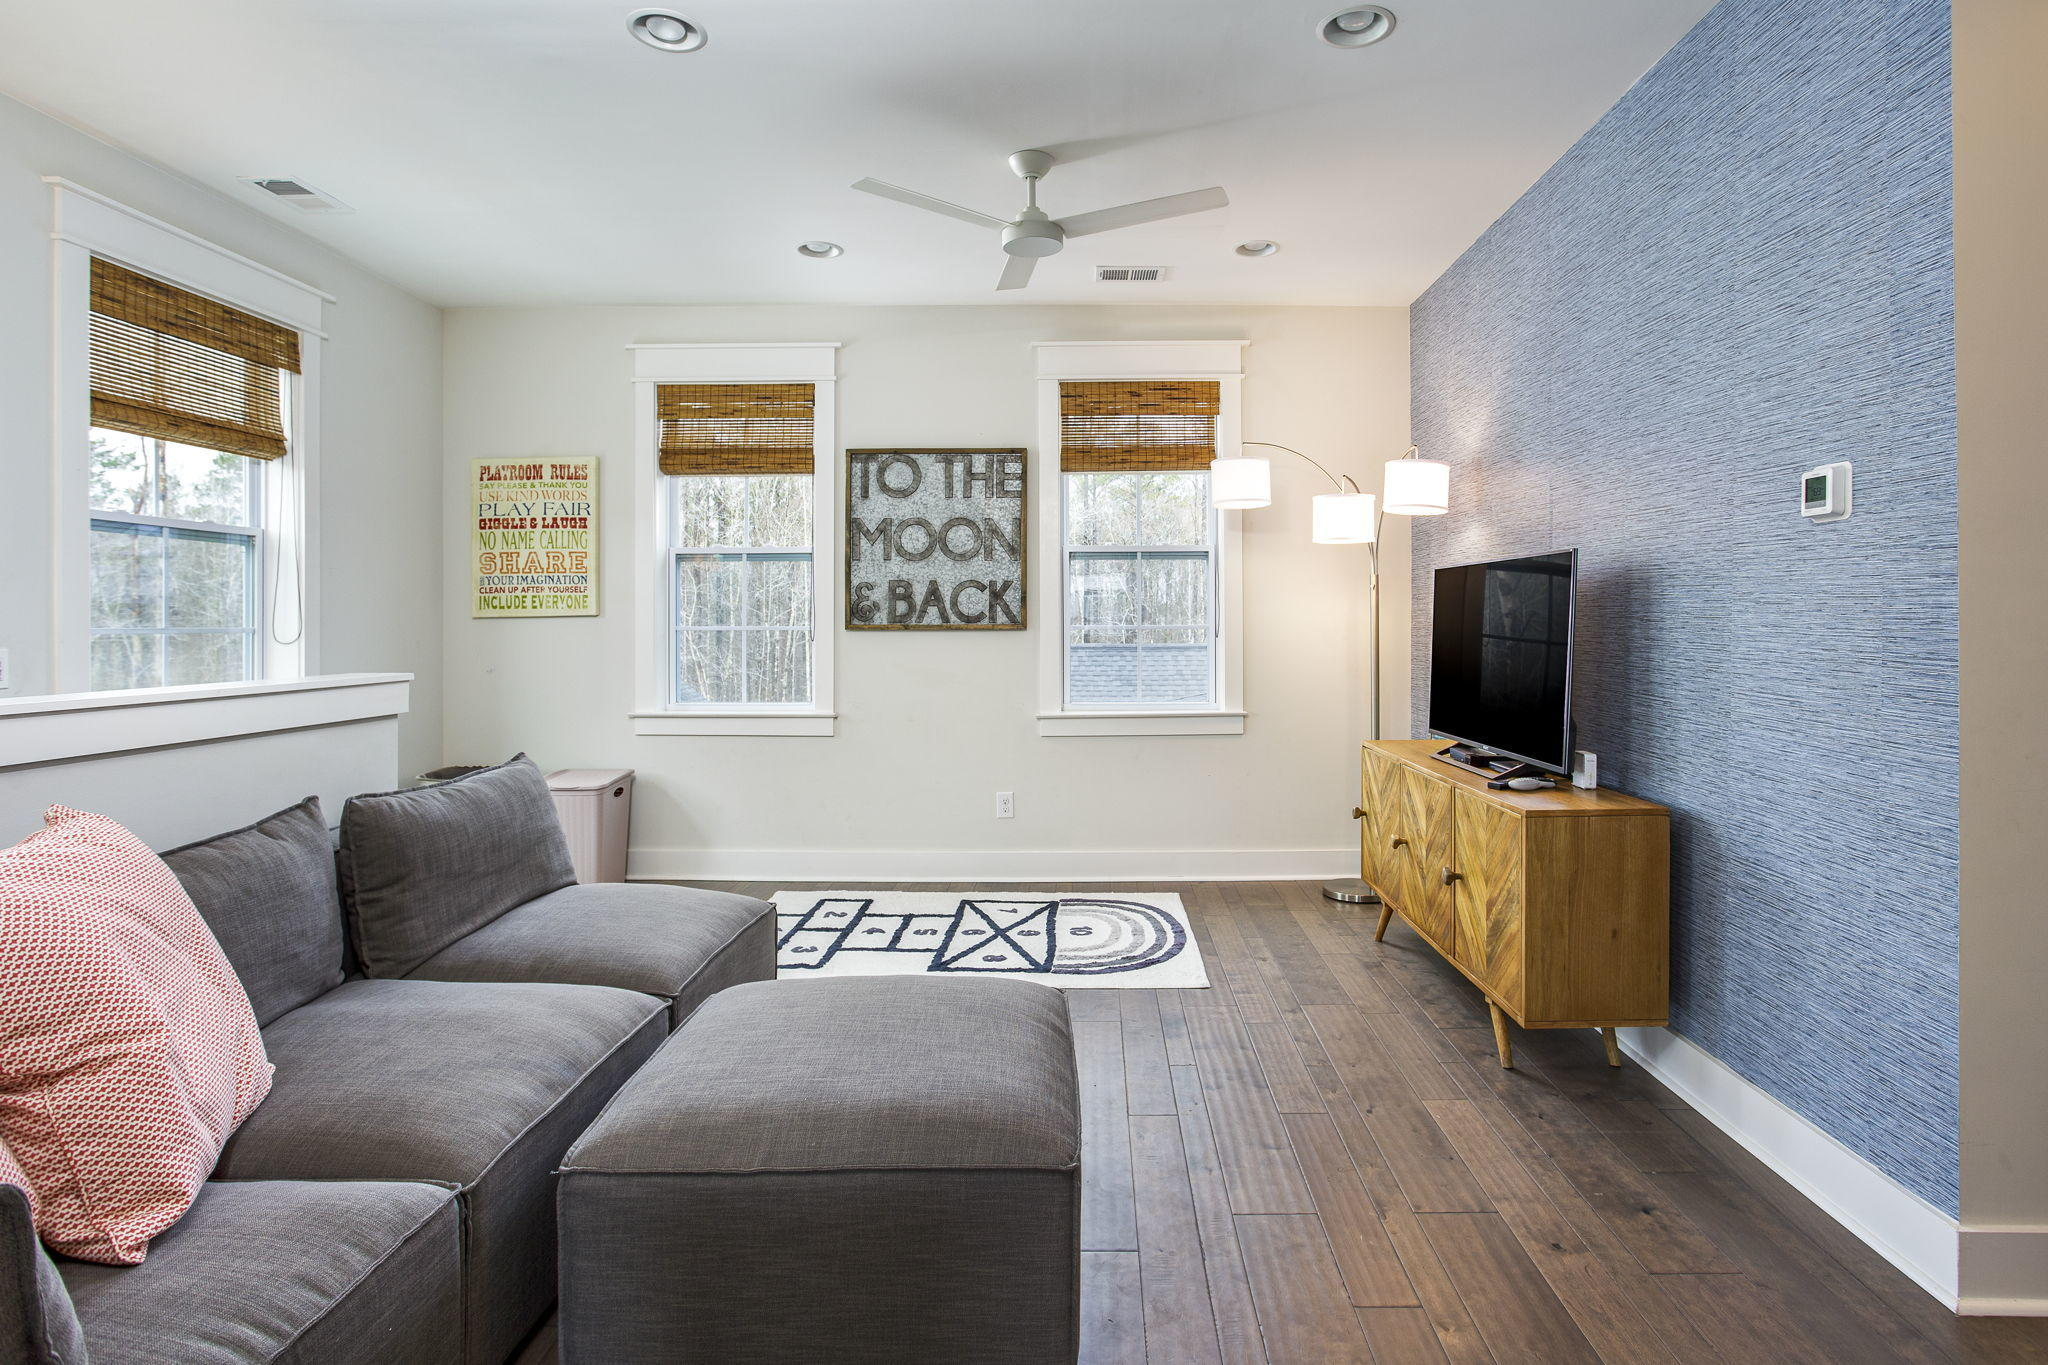 Carolina Park Homes For Sale - 3590 Backshore, Mount Pleasant, SC - 38